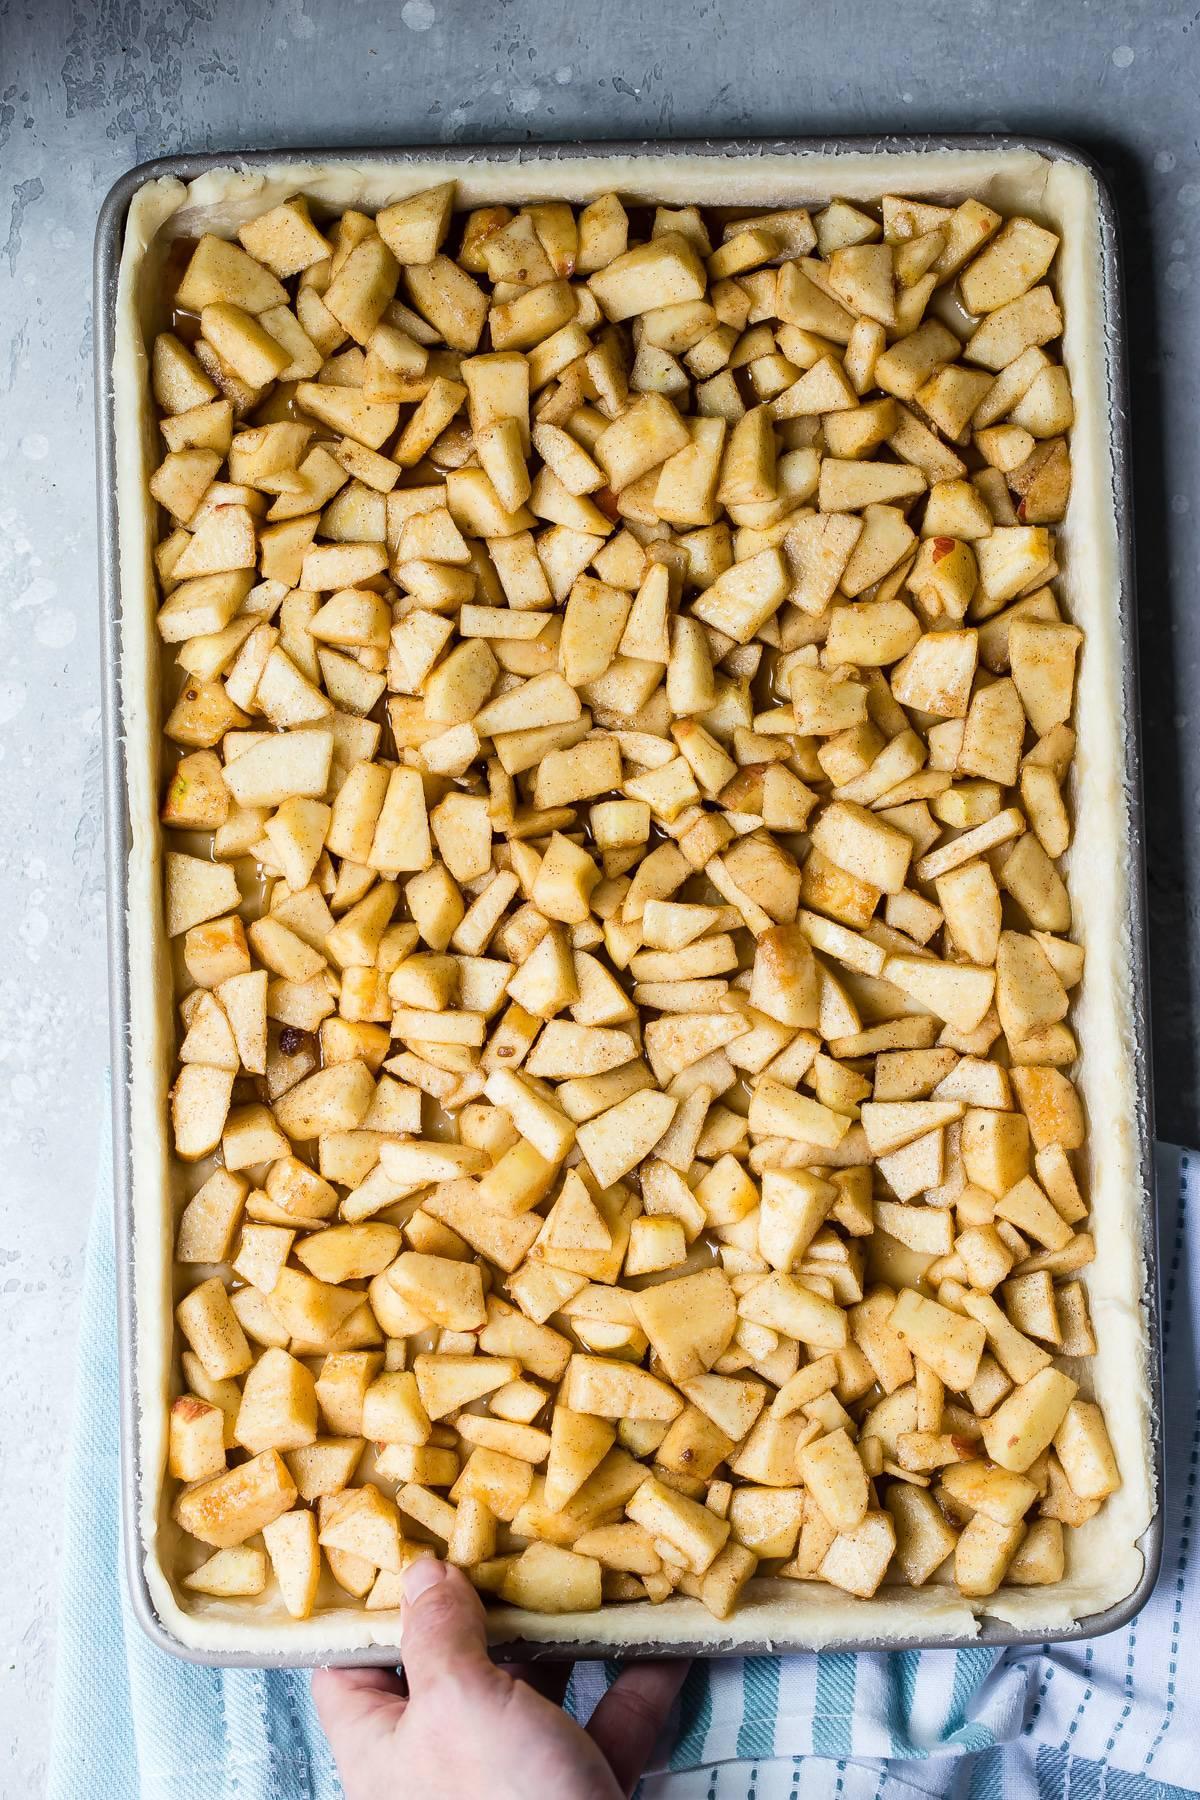 Apples in pie crust